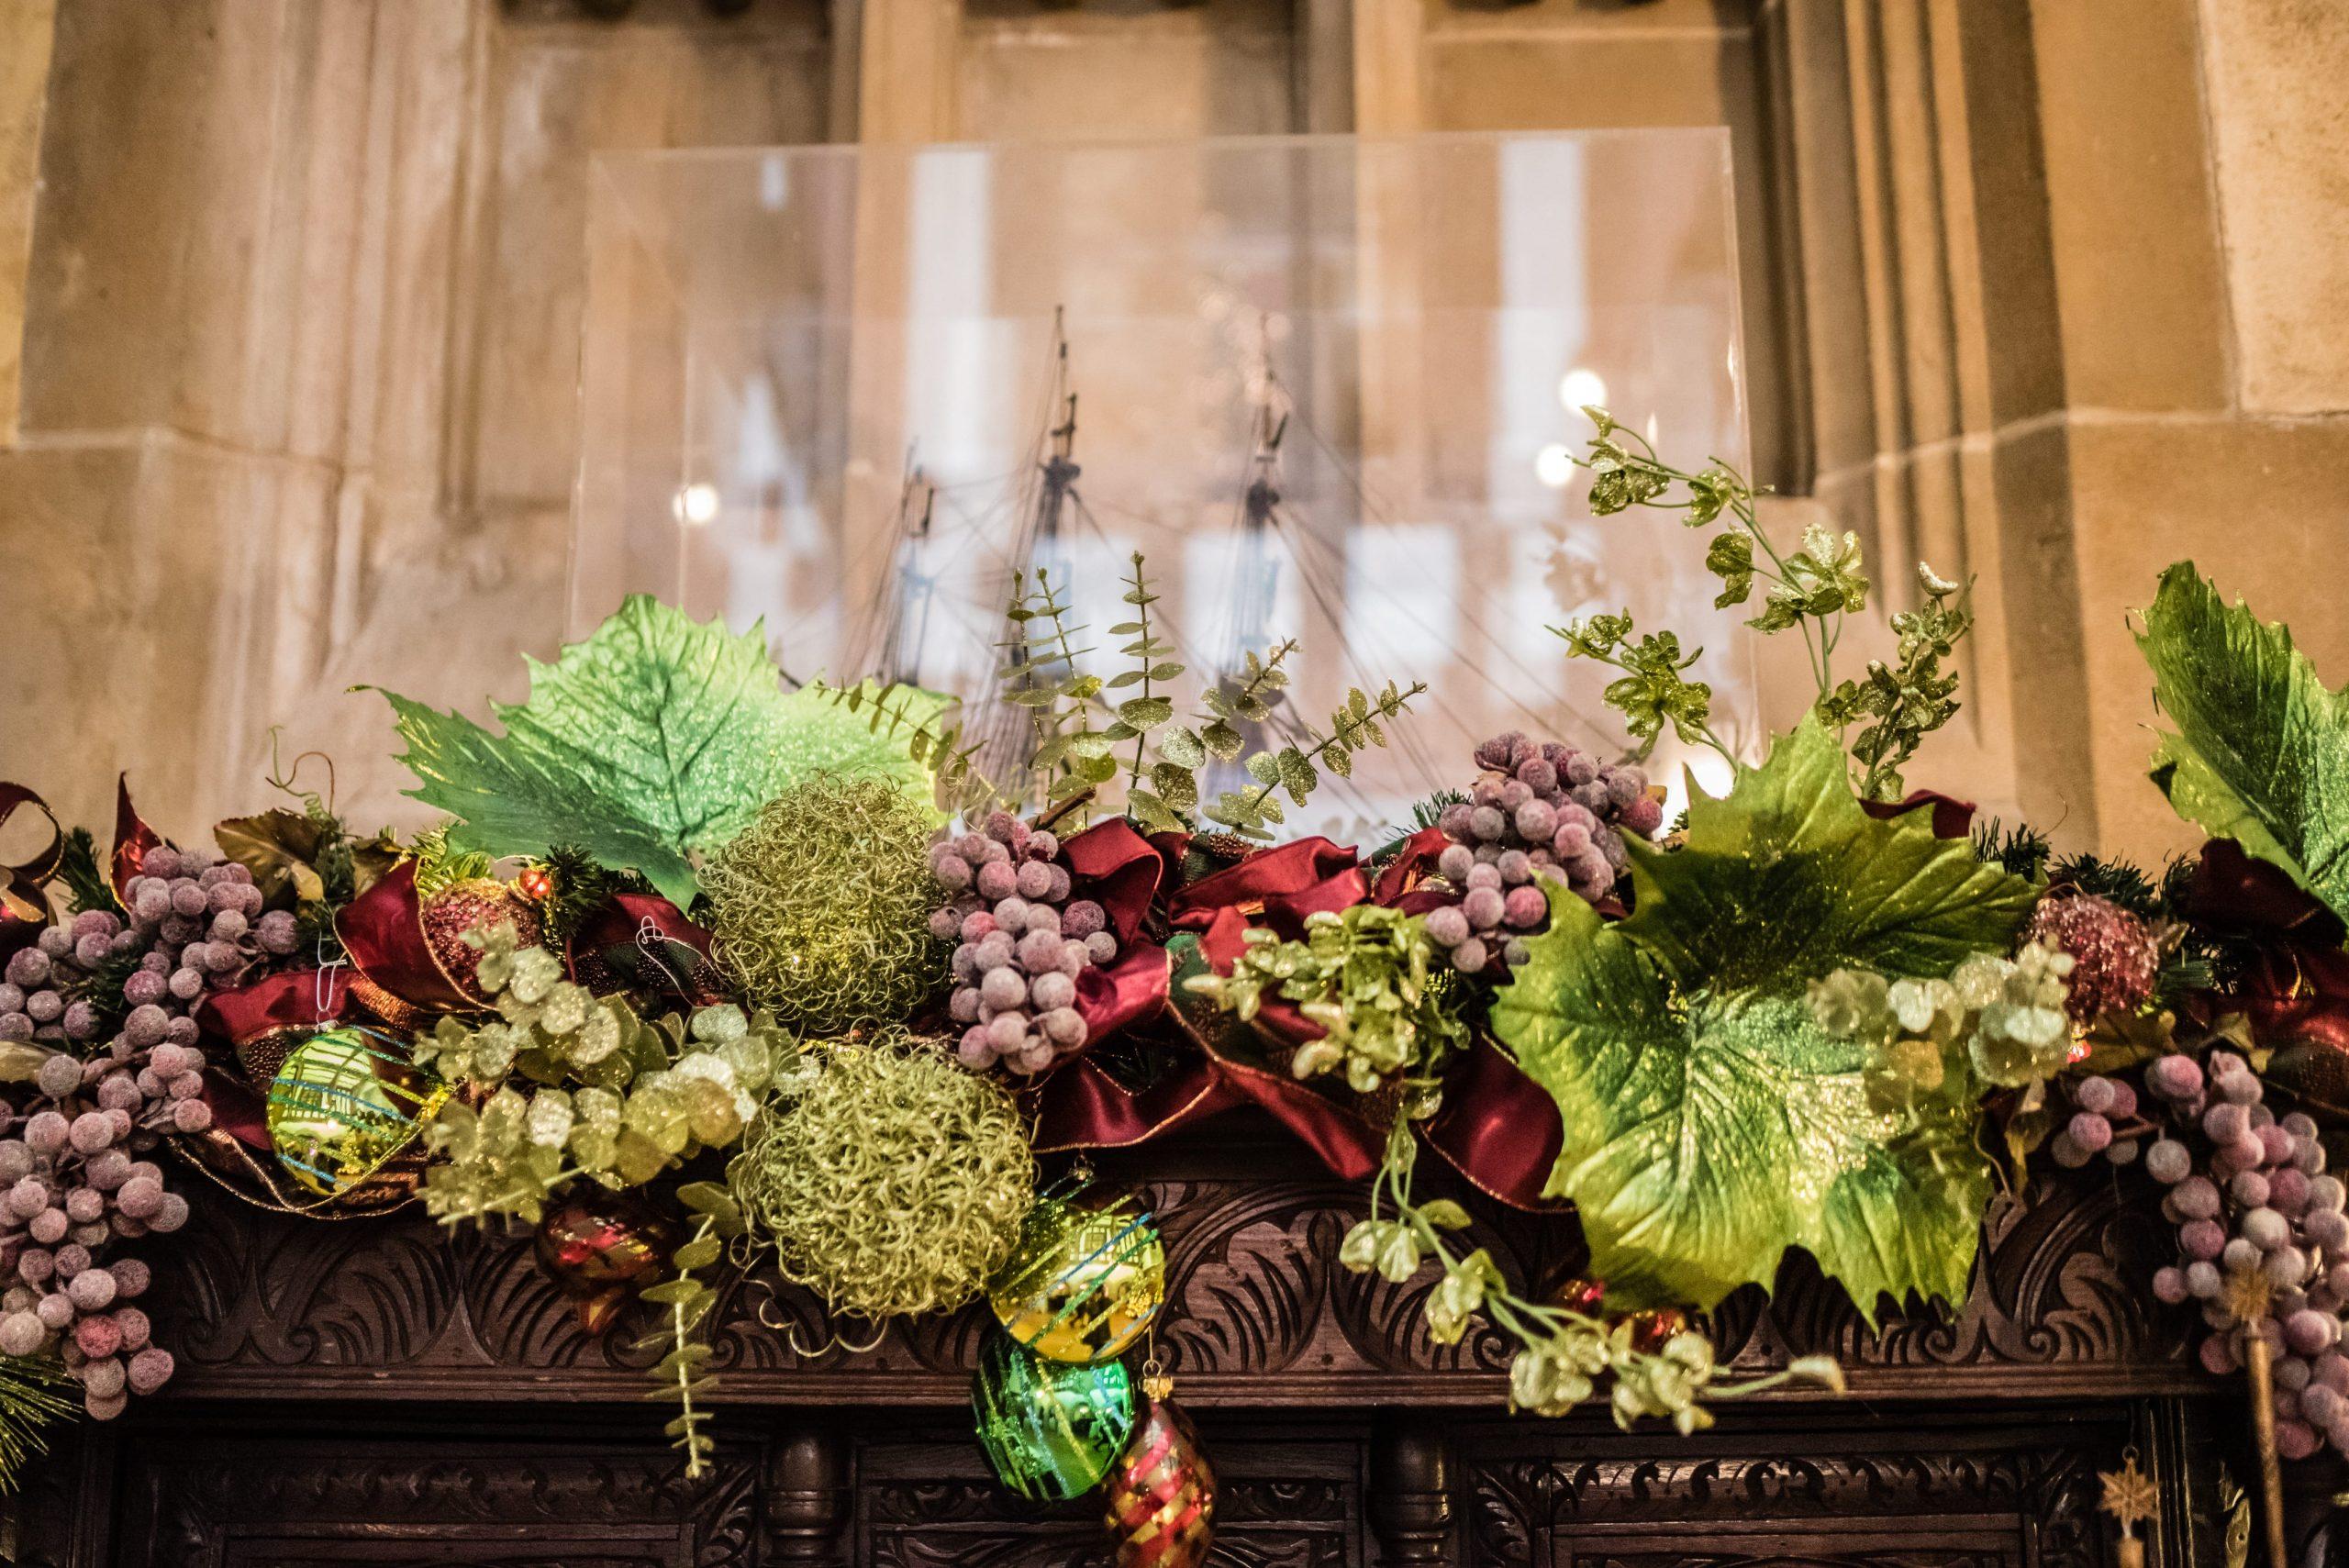 Christmas floral details